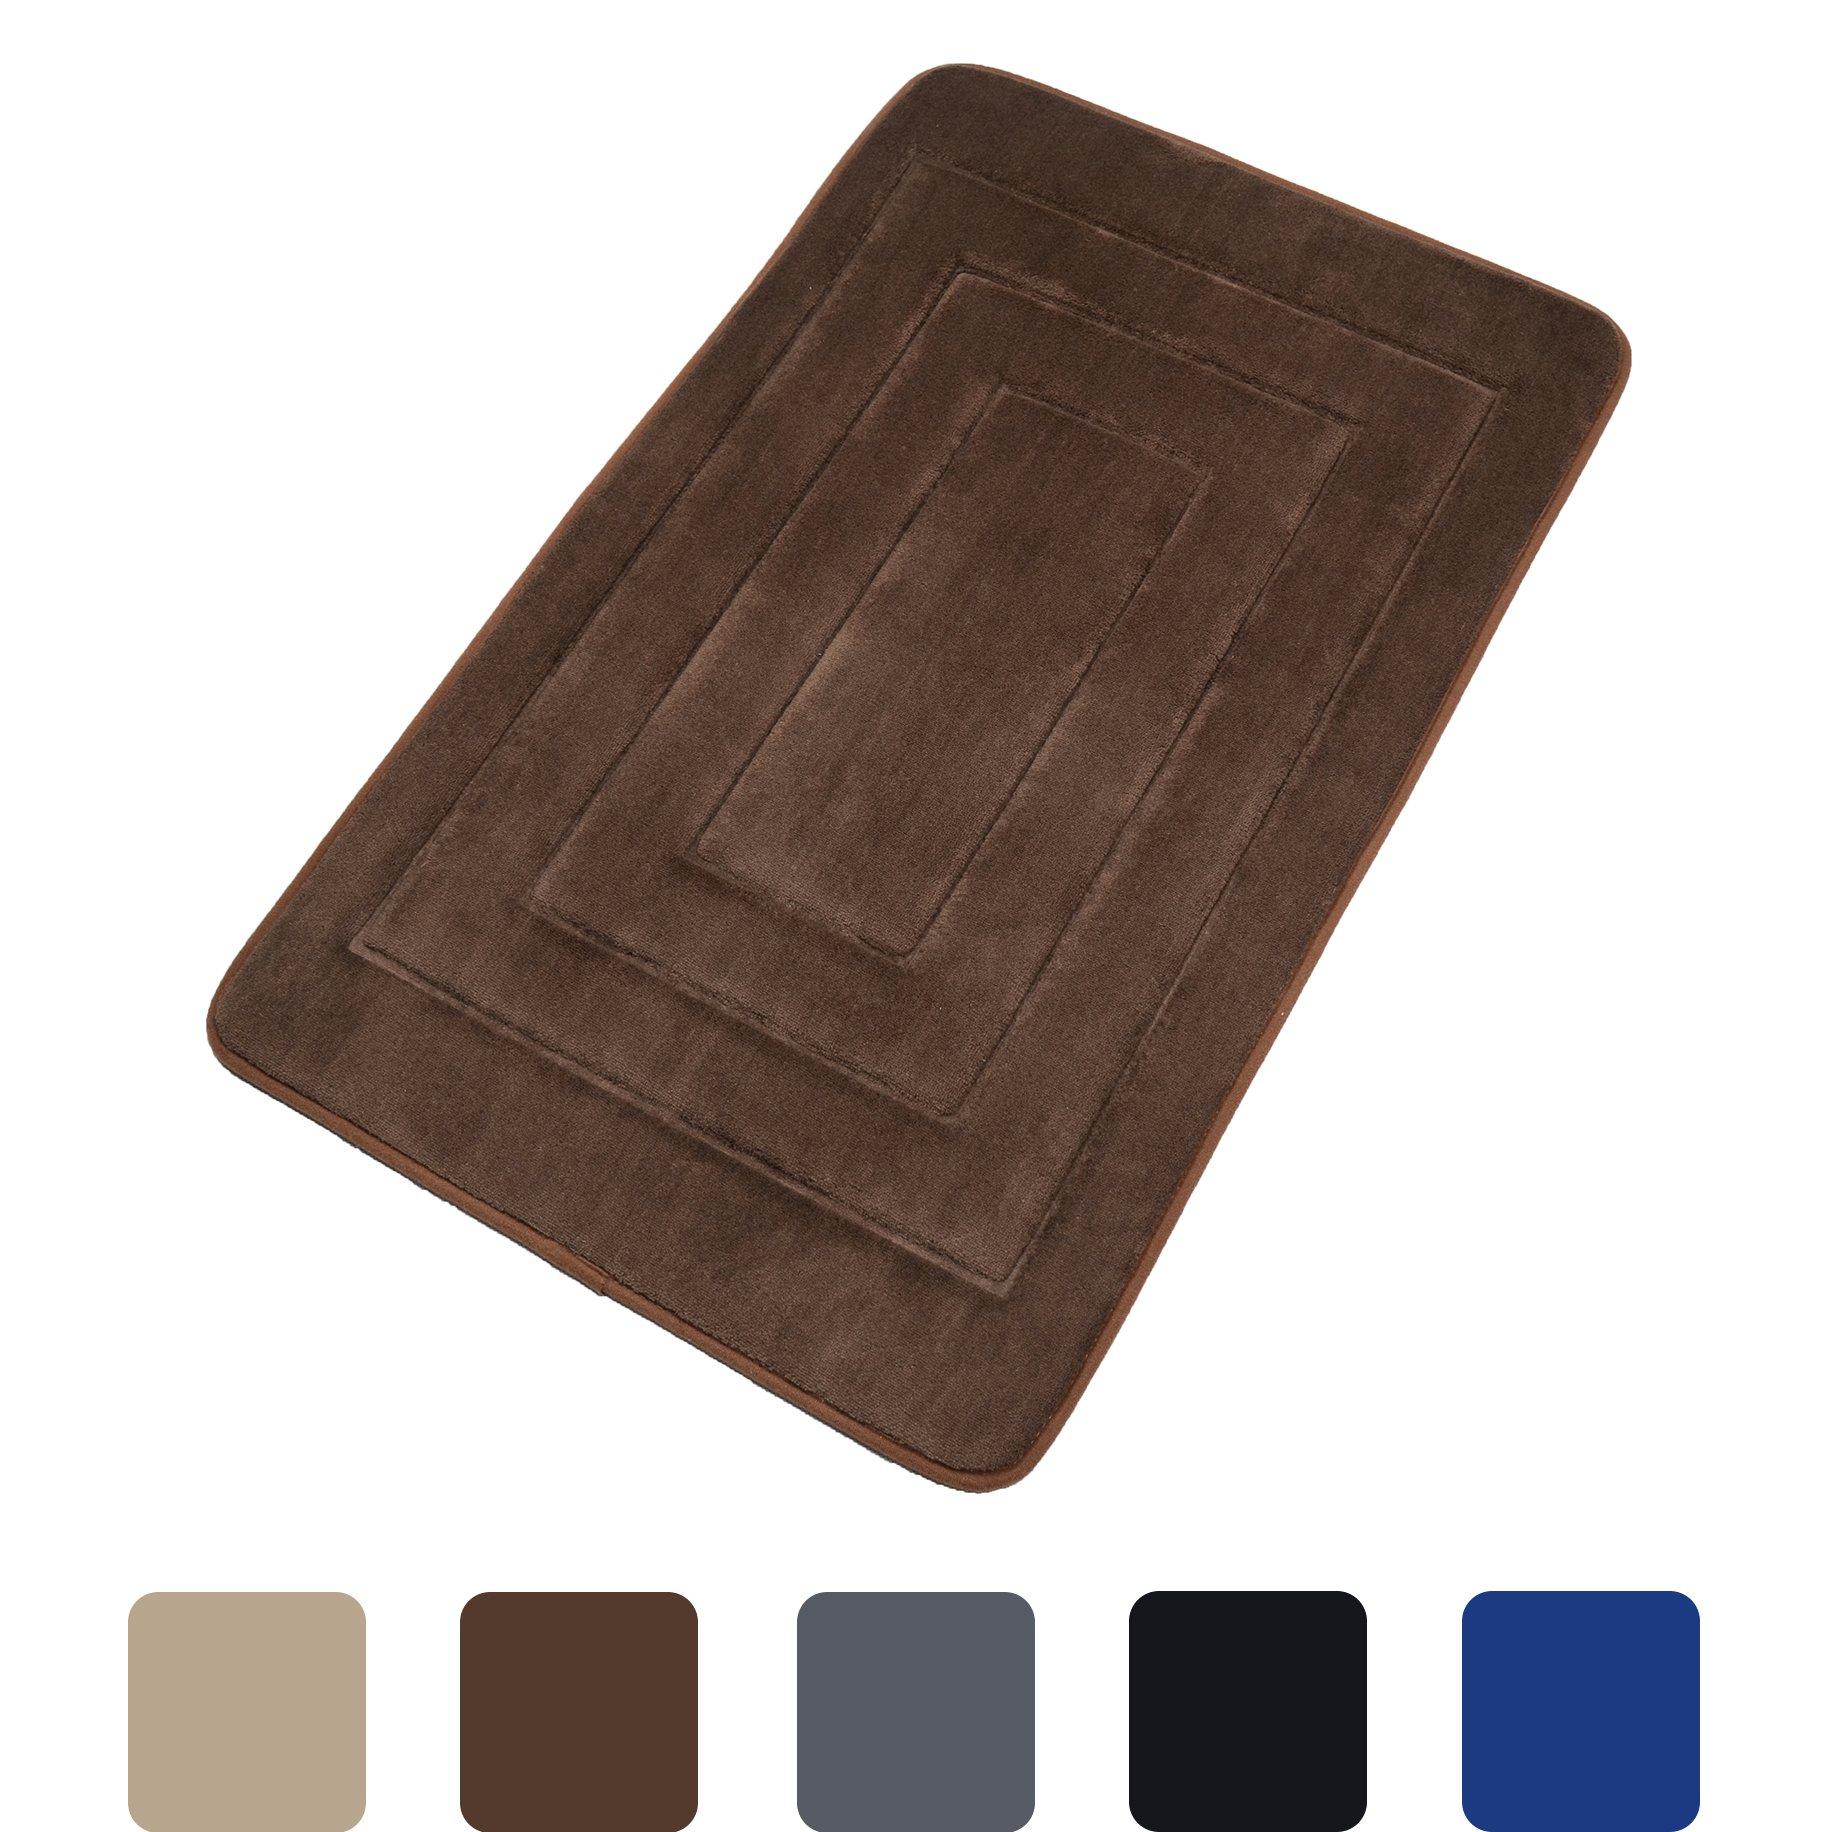 Elegant Bath Mat Soft Bathroom Rugs Non-slip Rubber Shower Rugs Comfortable Coral Velvet Bathroom Mat (20'' x 32'' Rectangle, Brown)